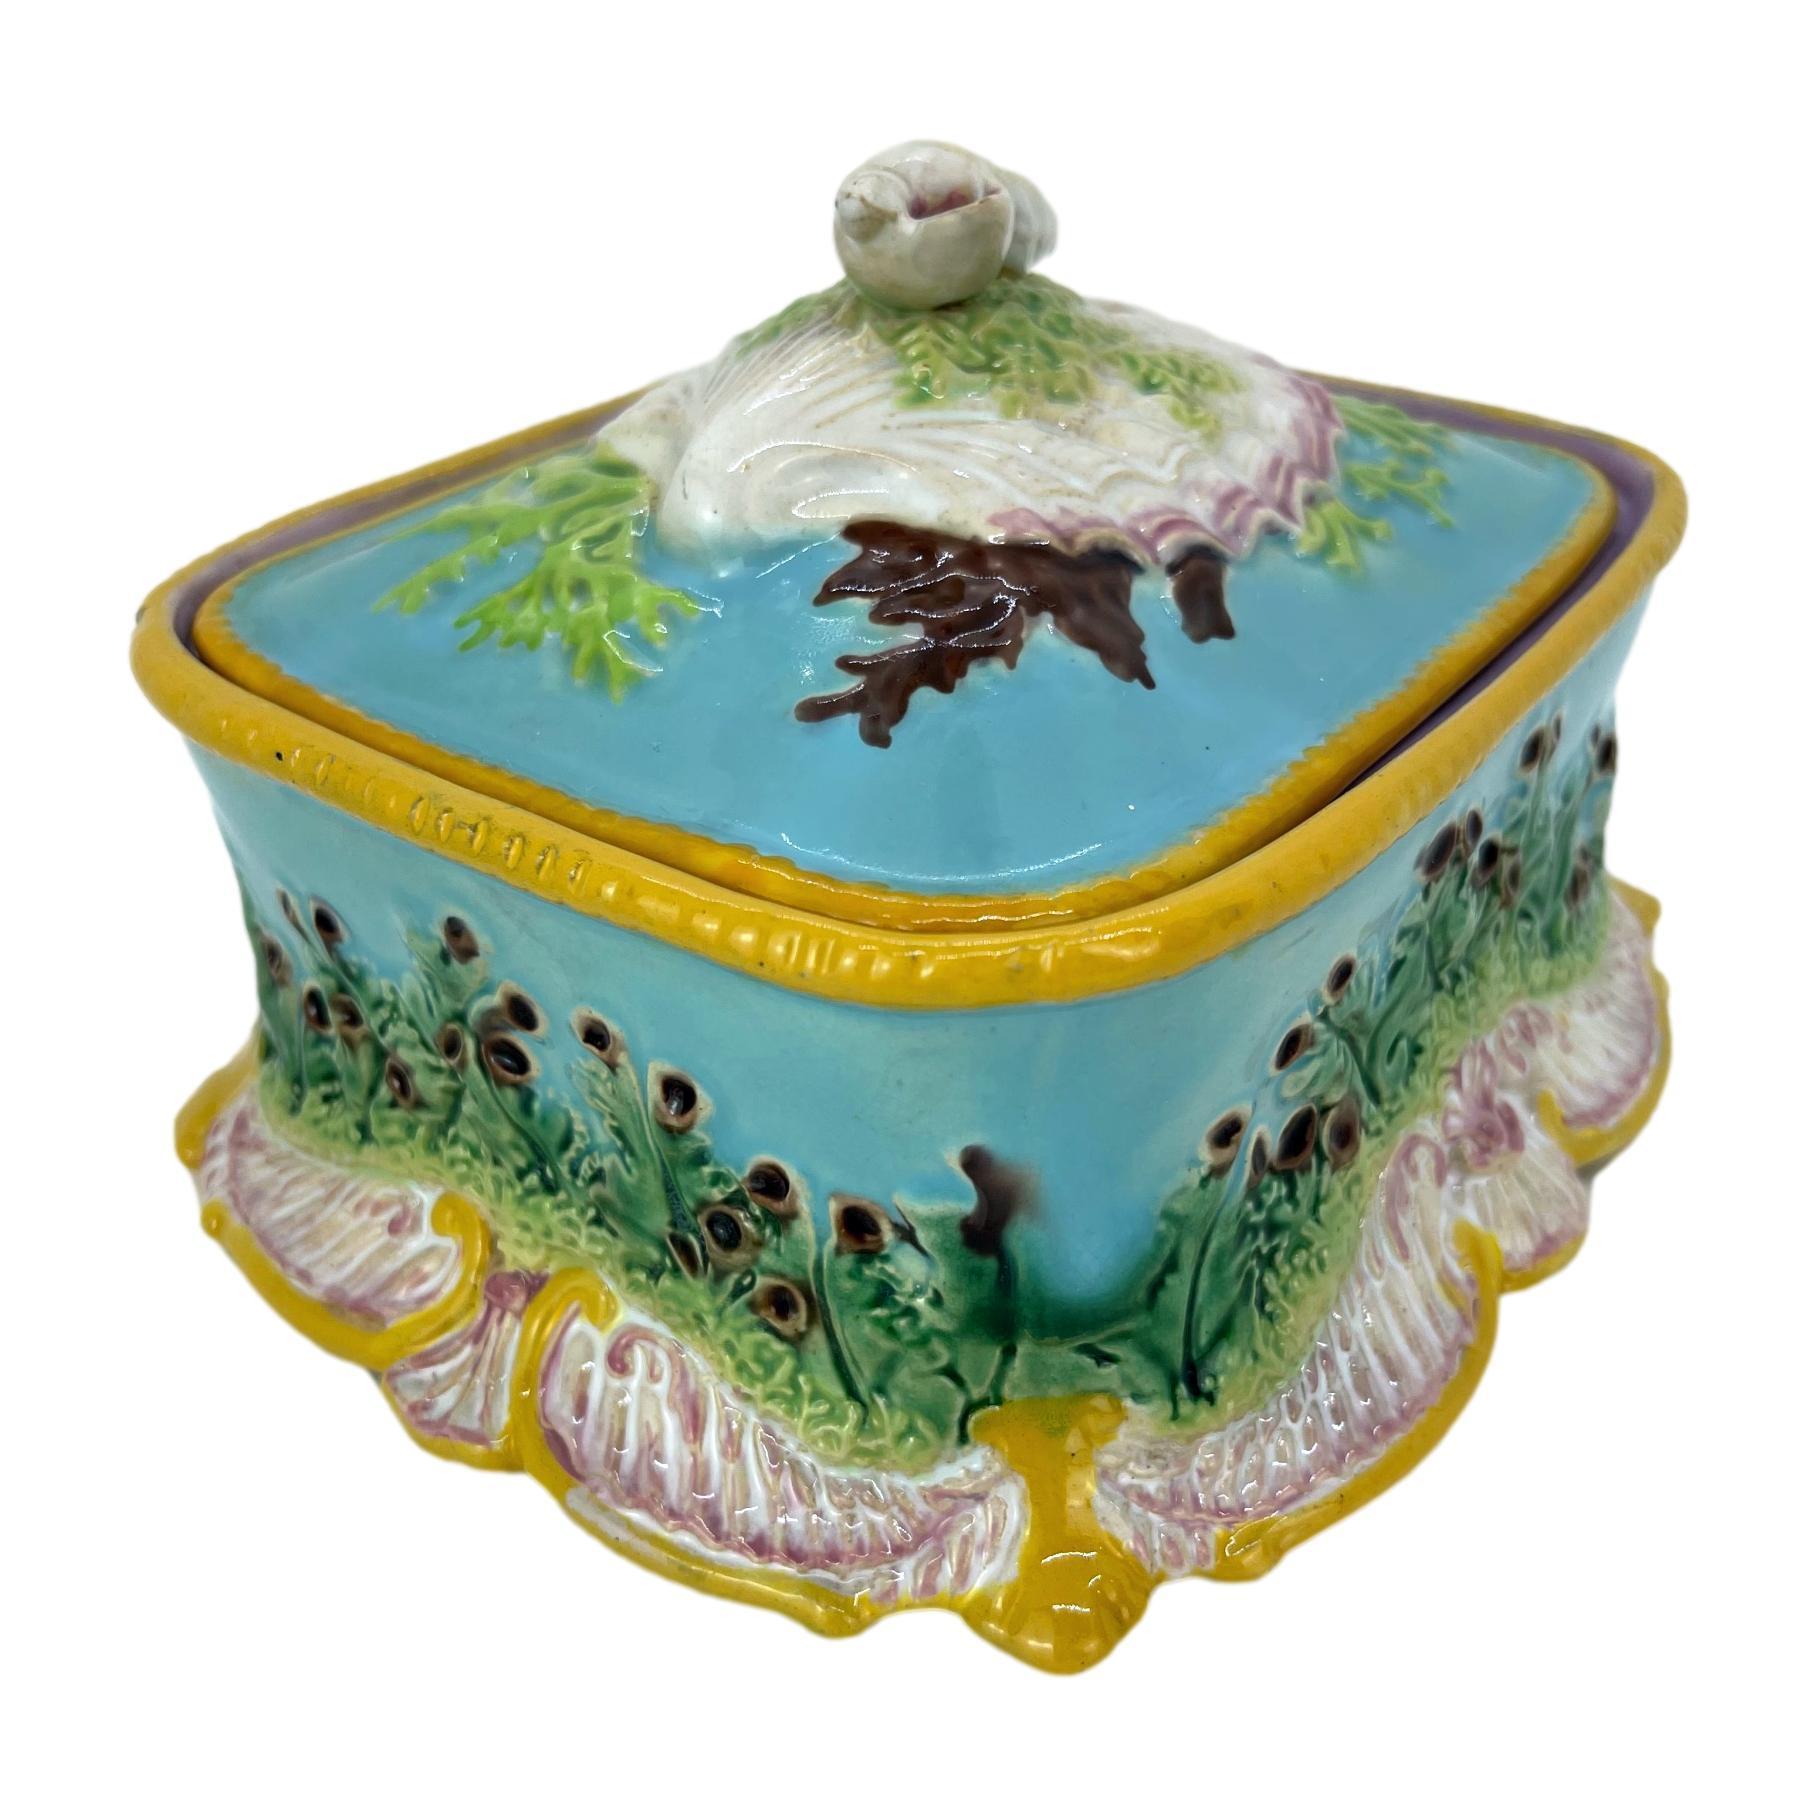 George Jones Majolica Sardine Box with Shells and Seaweed, English, ca. 1867